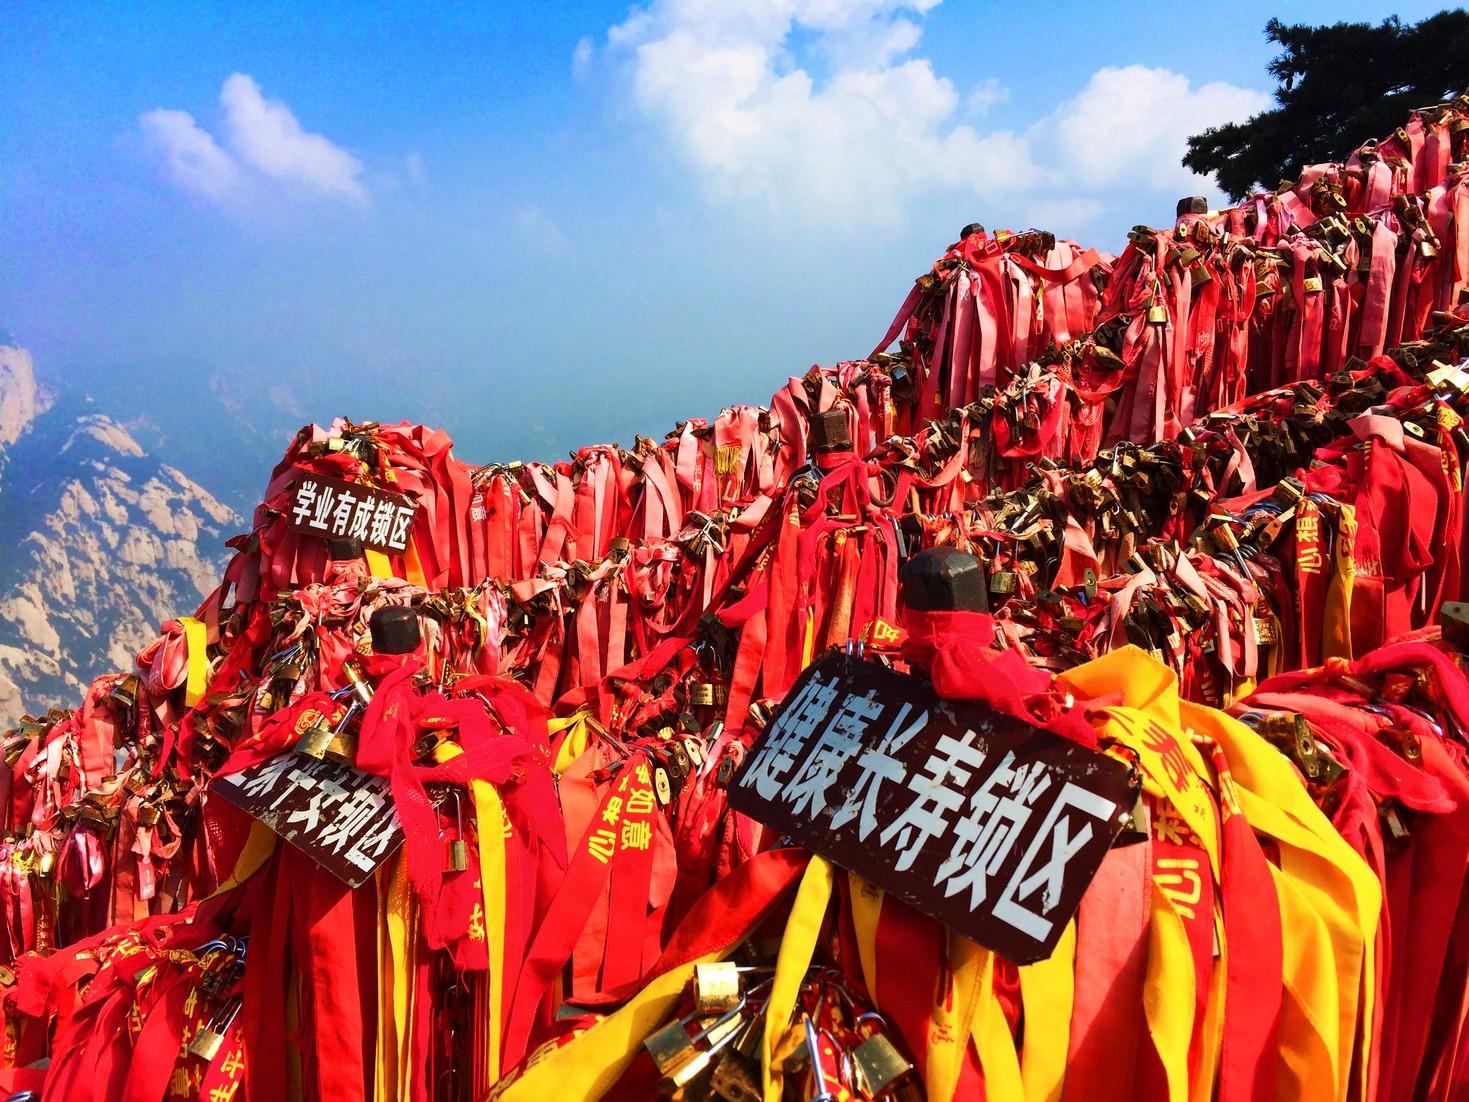 chinese-love-locks-on-chain-huashan-national-park-4